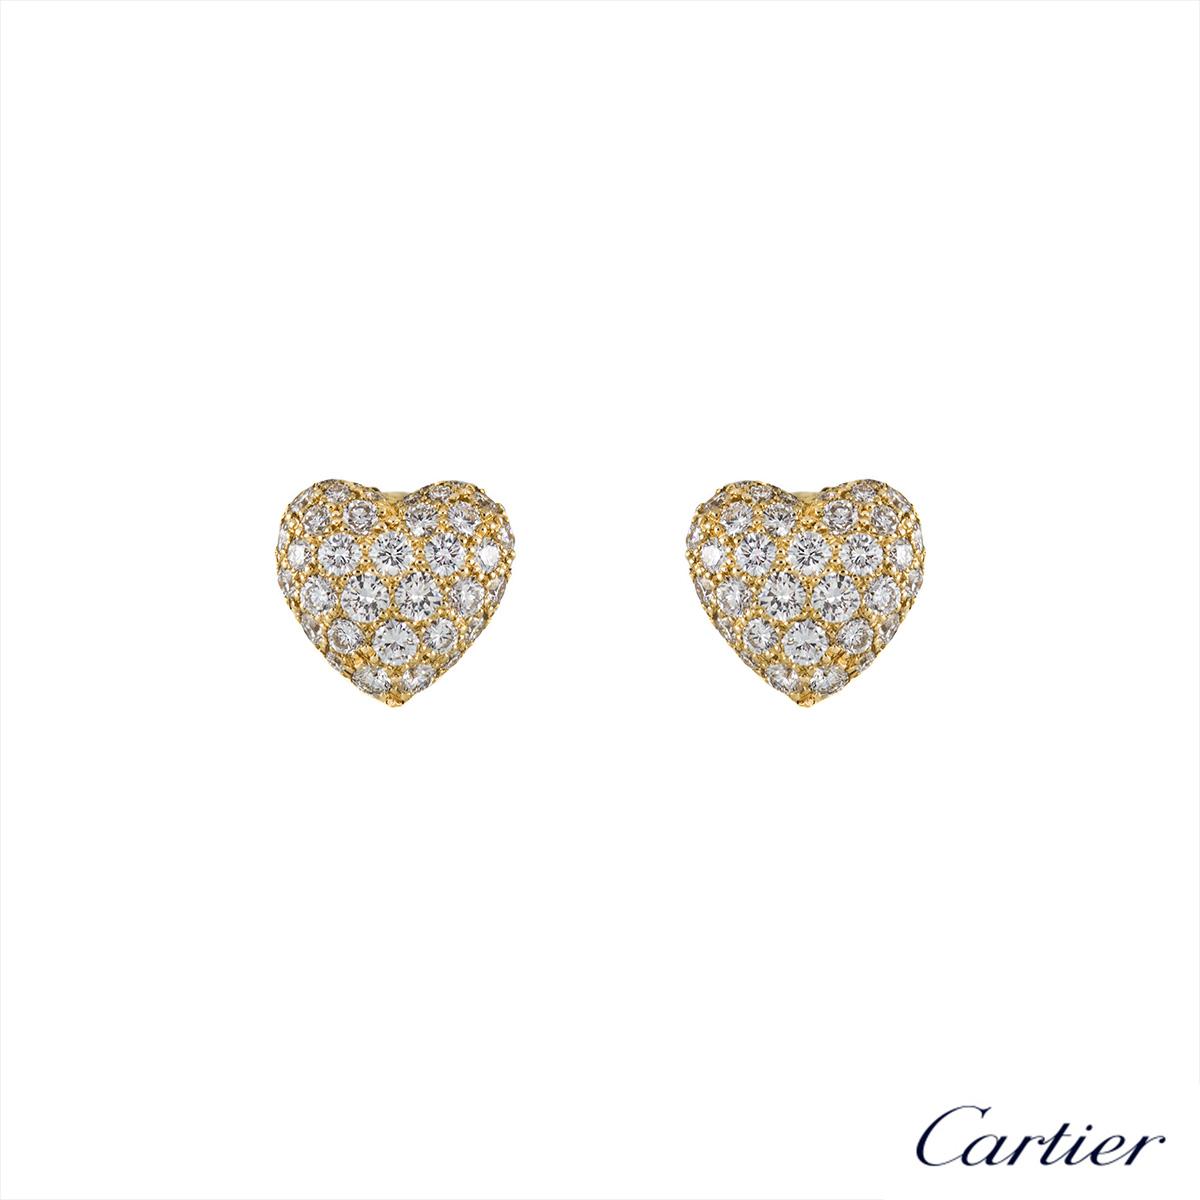 Cartier 18k Yellow Gold Diamond Set Heart Earrings